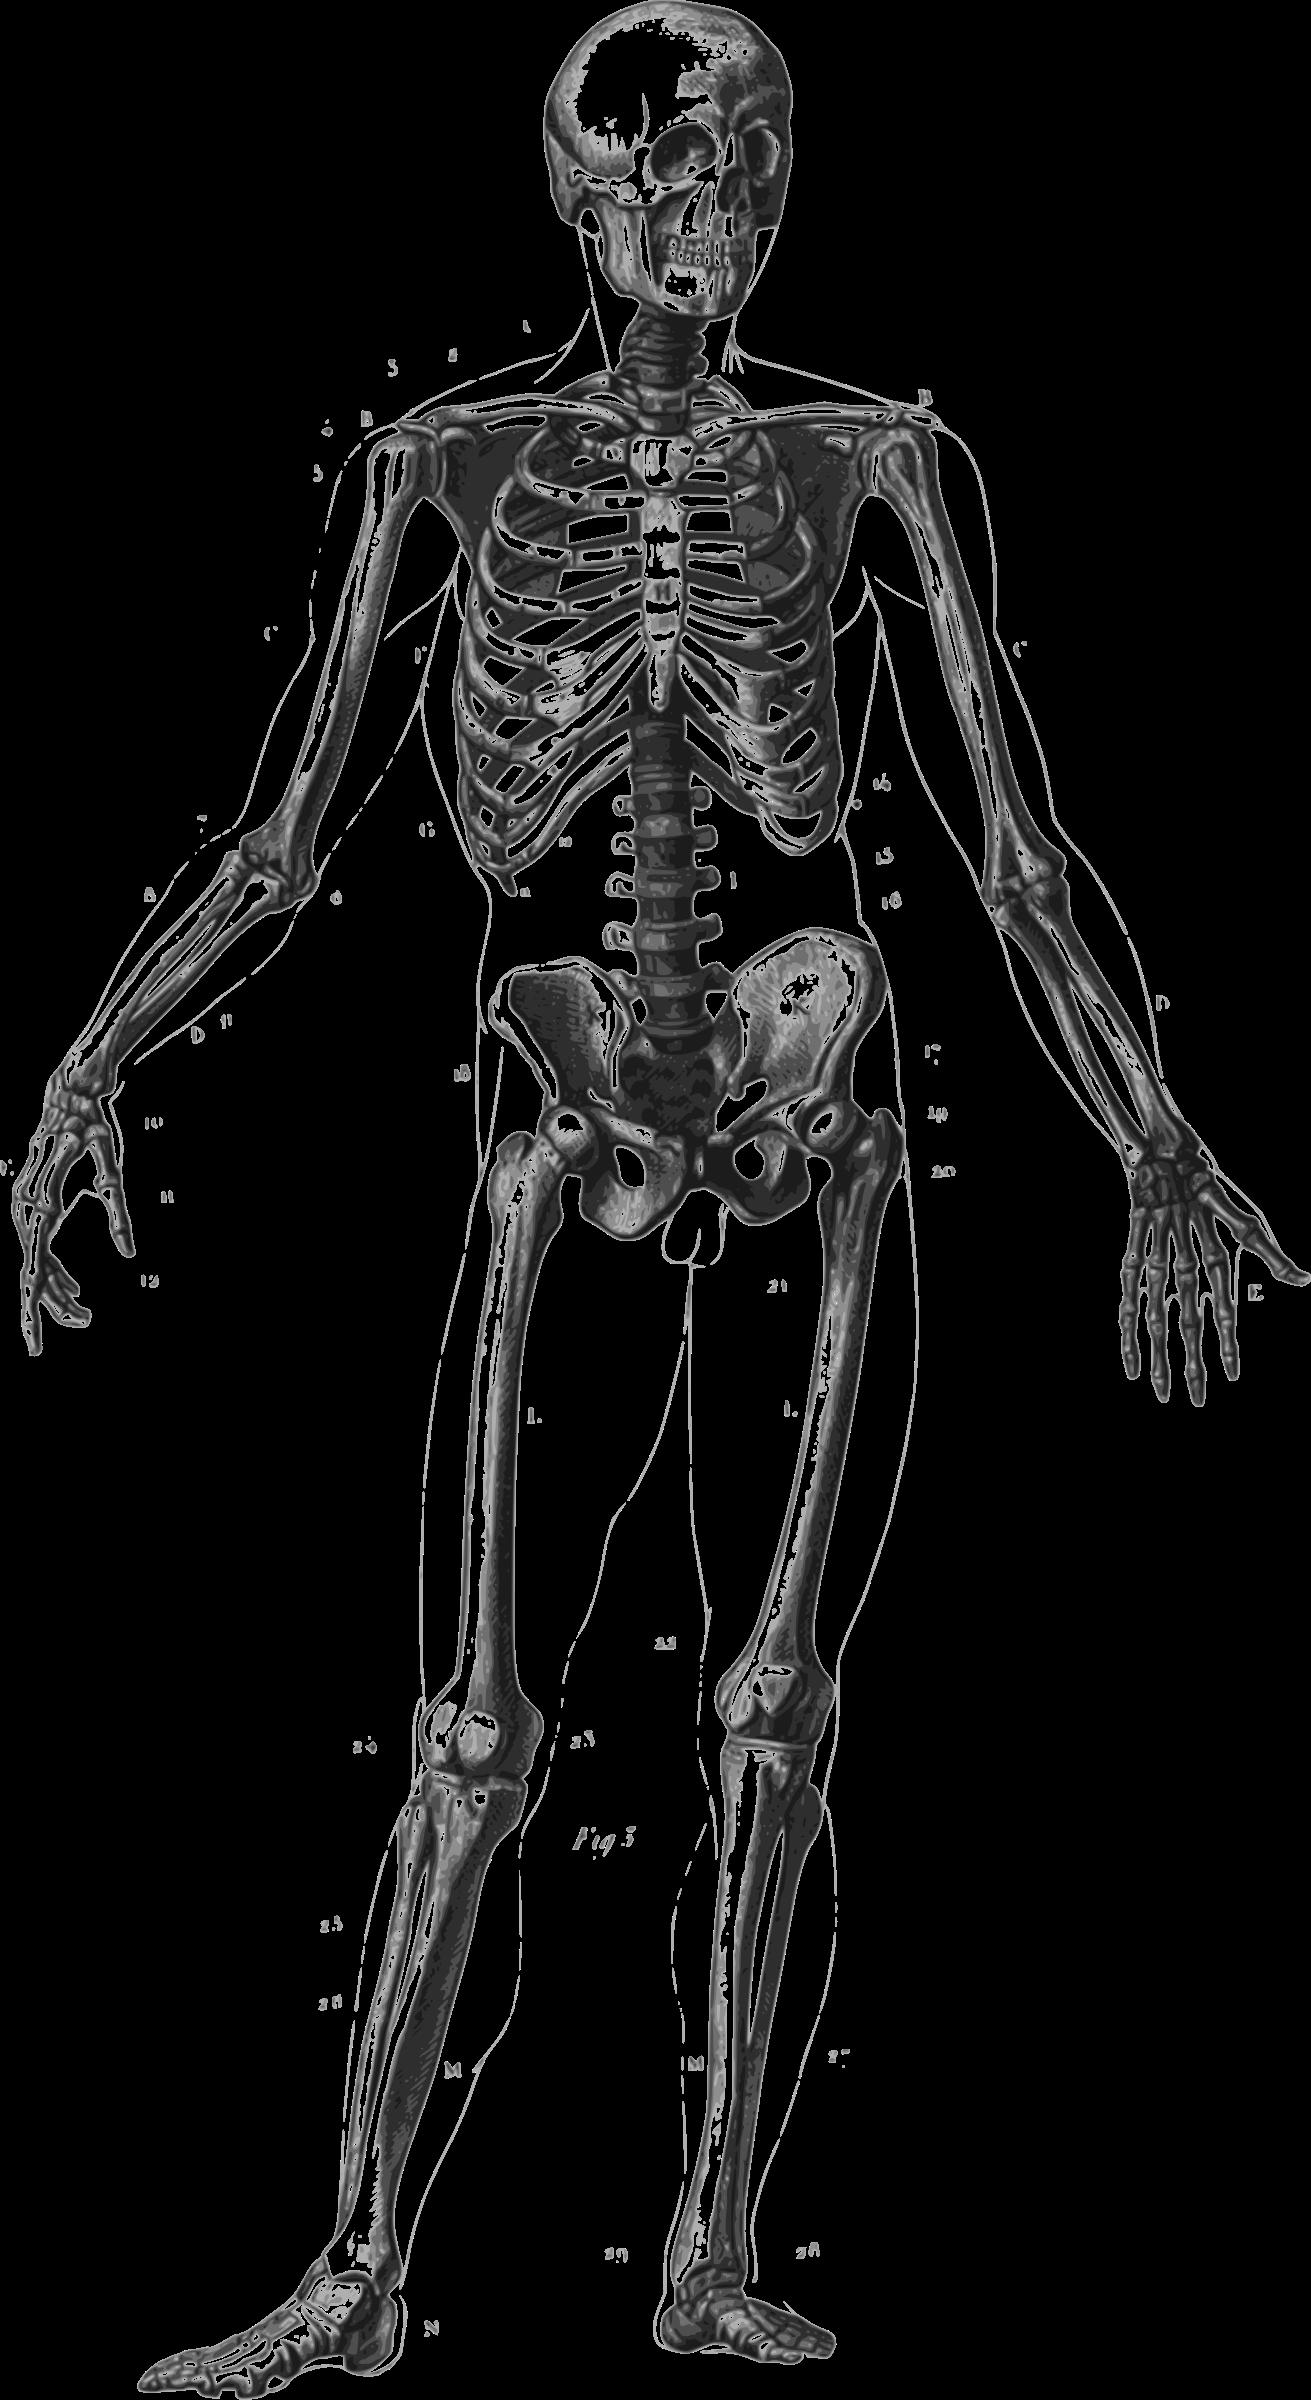 Transparent transparentpng . Skeleton clipart body part